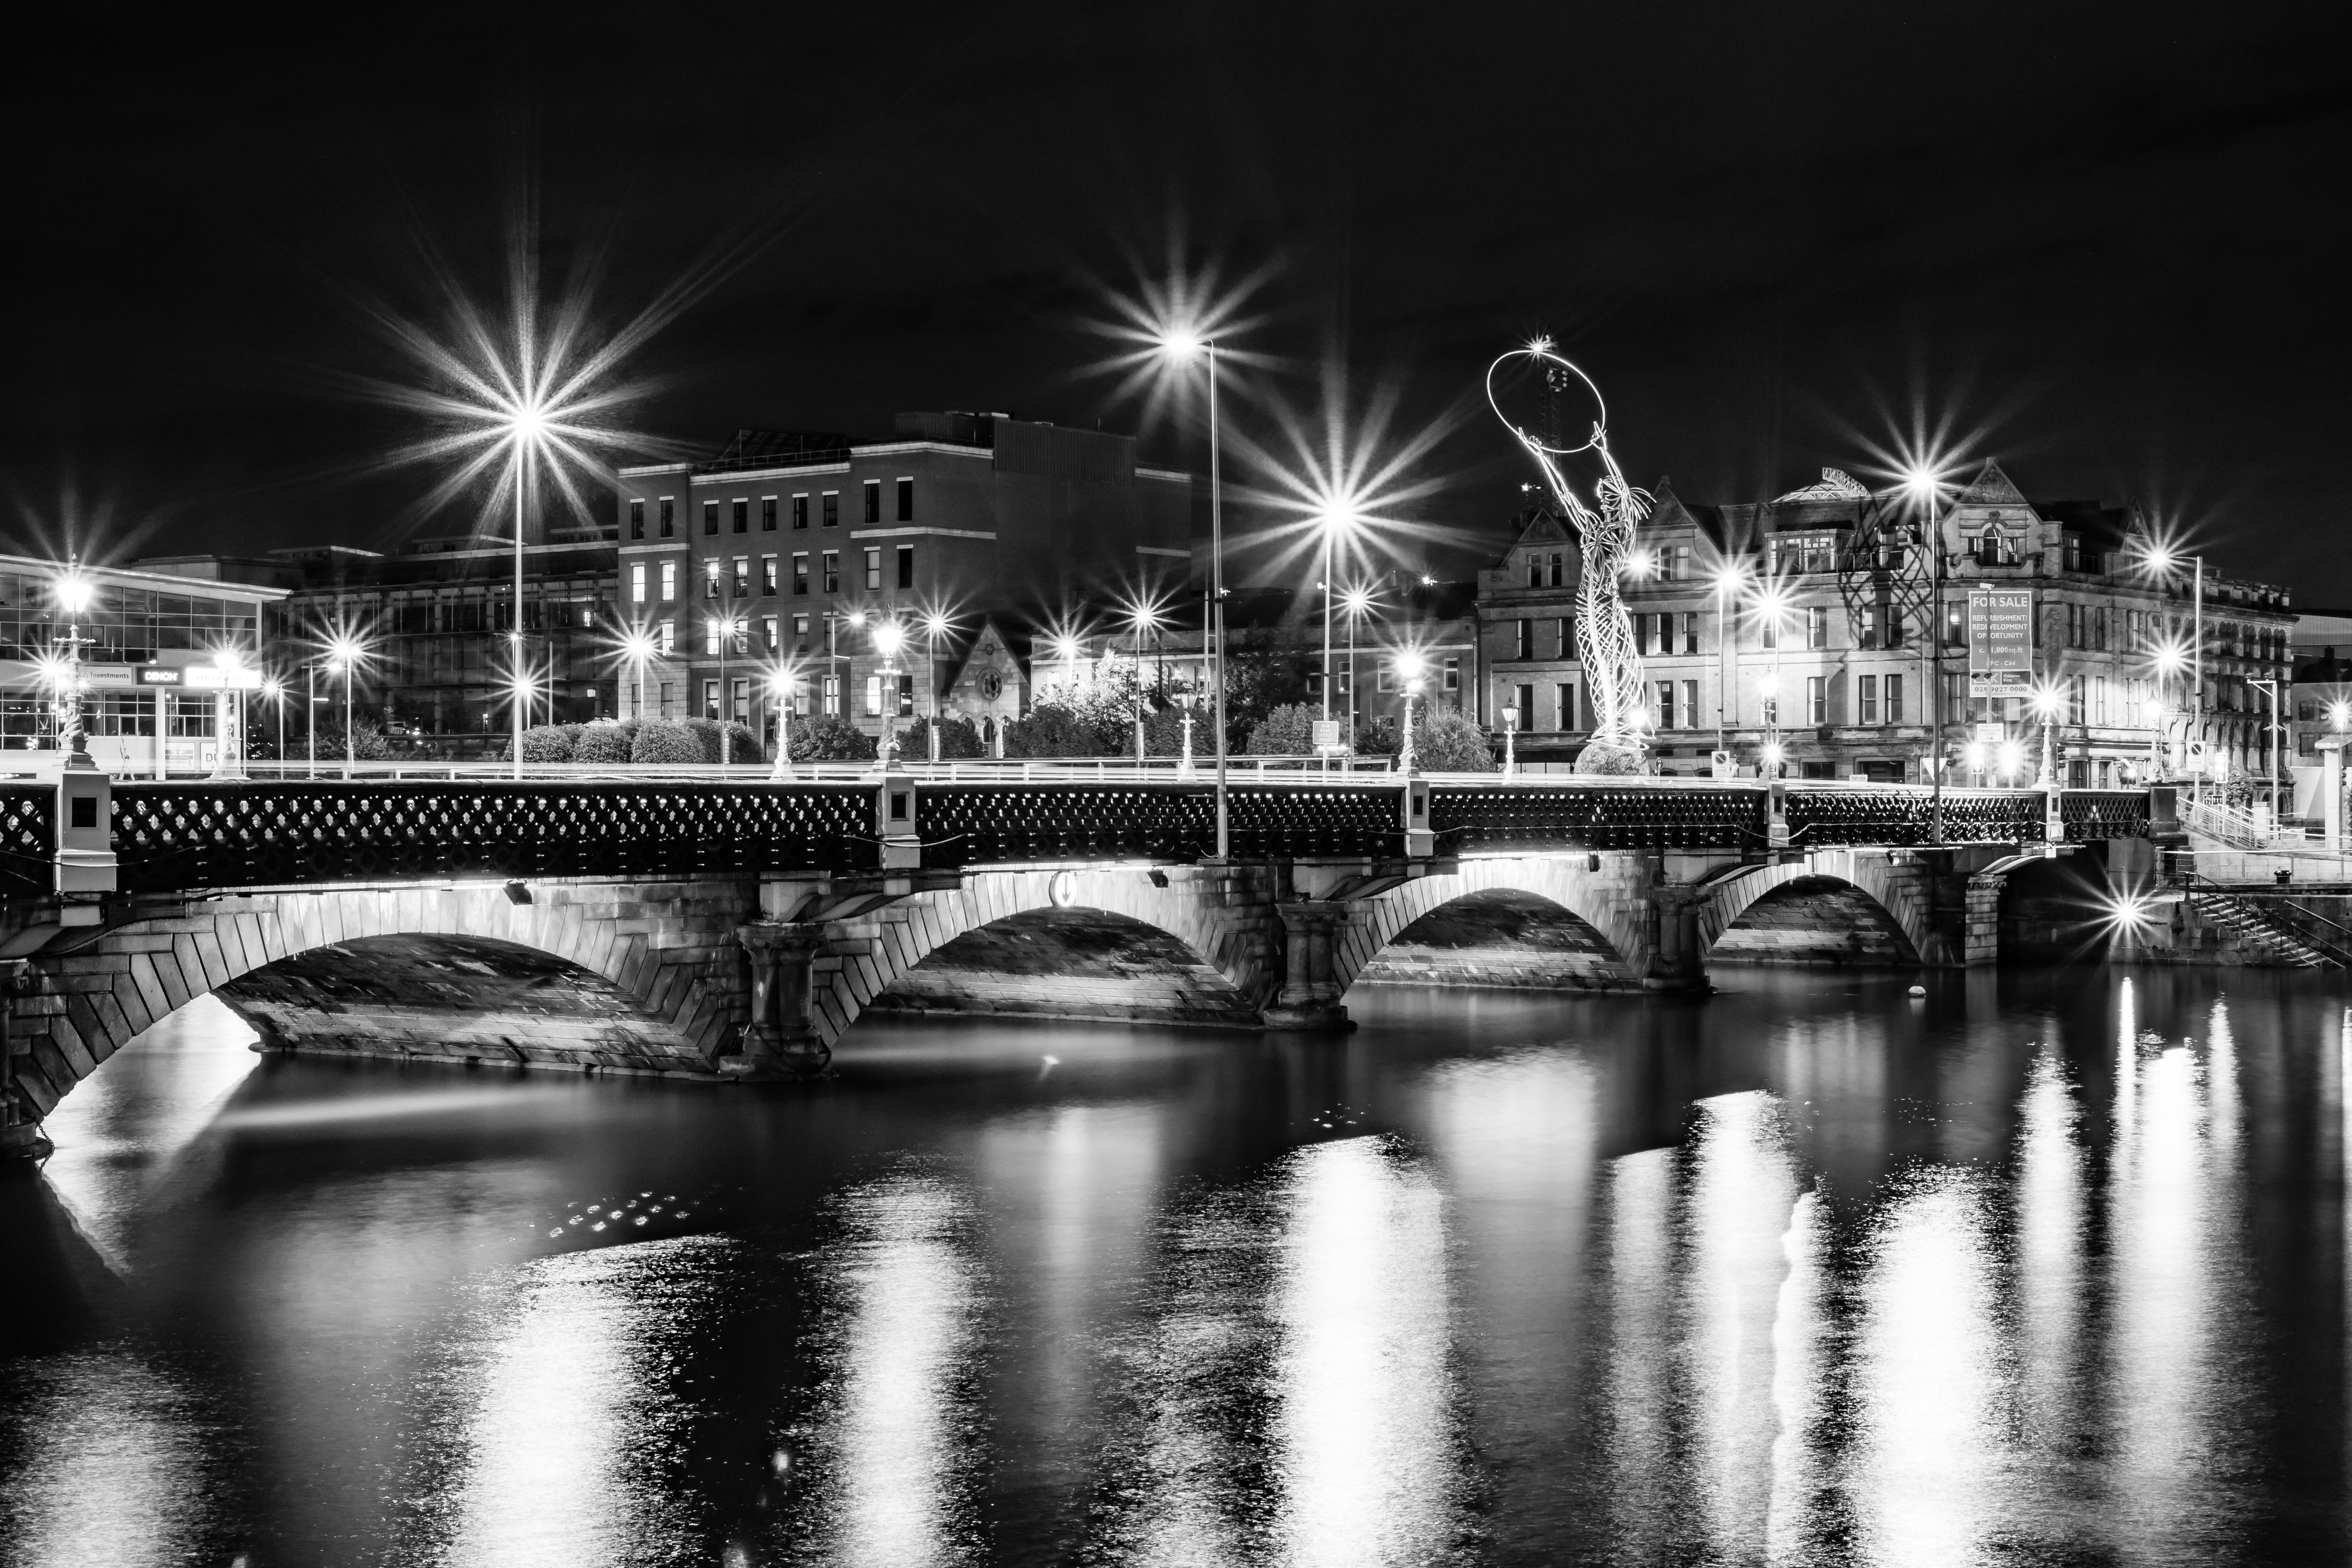 Shining Night Queens Bridge - REF:74